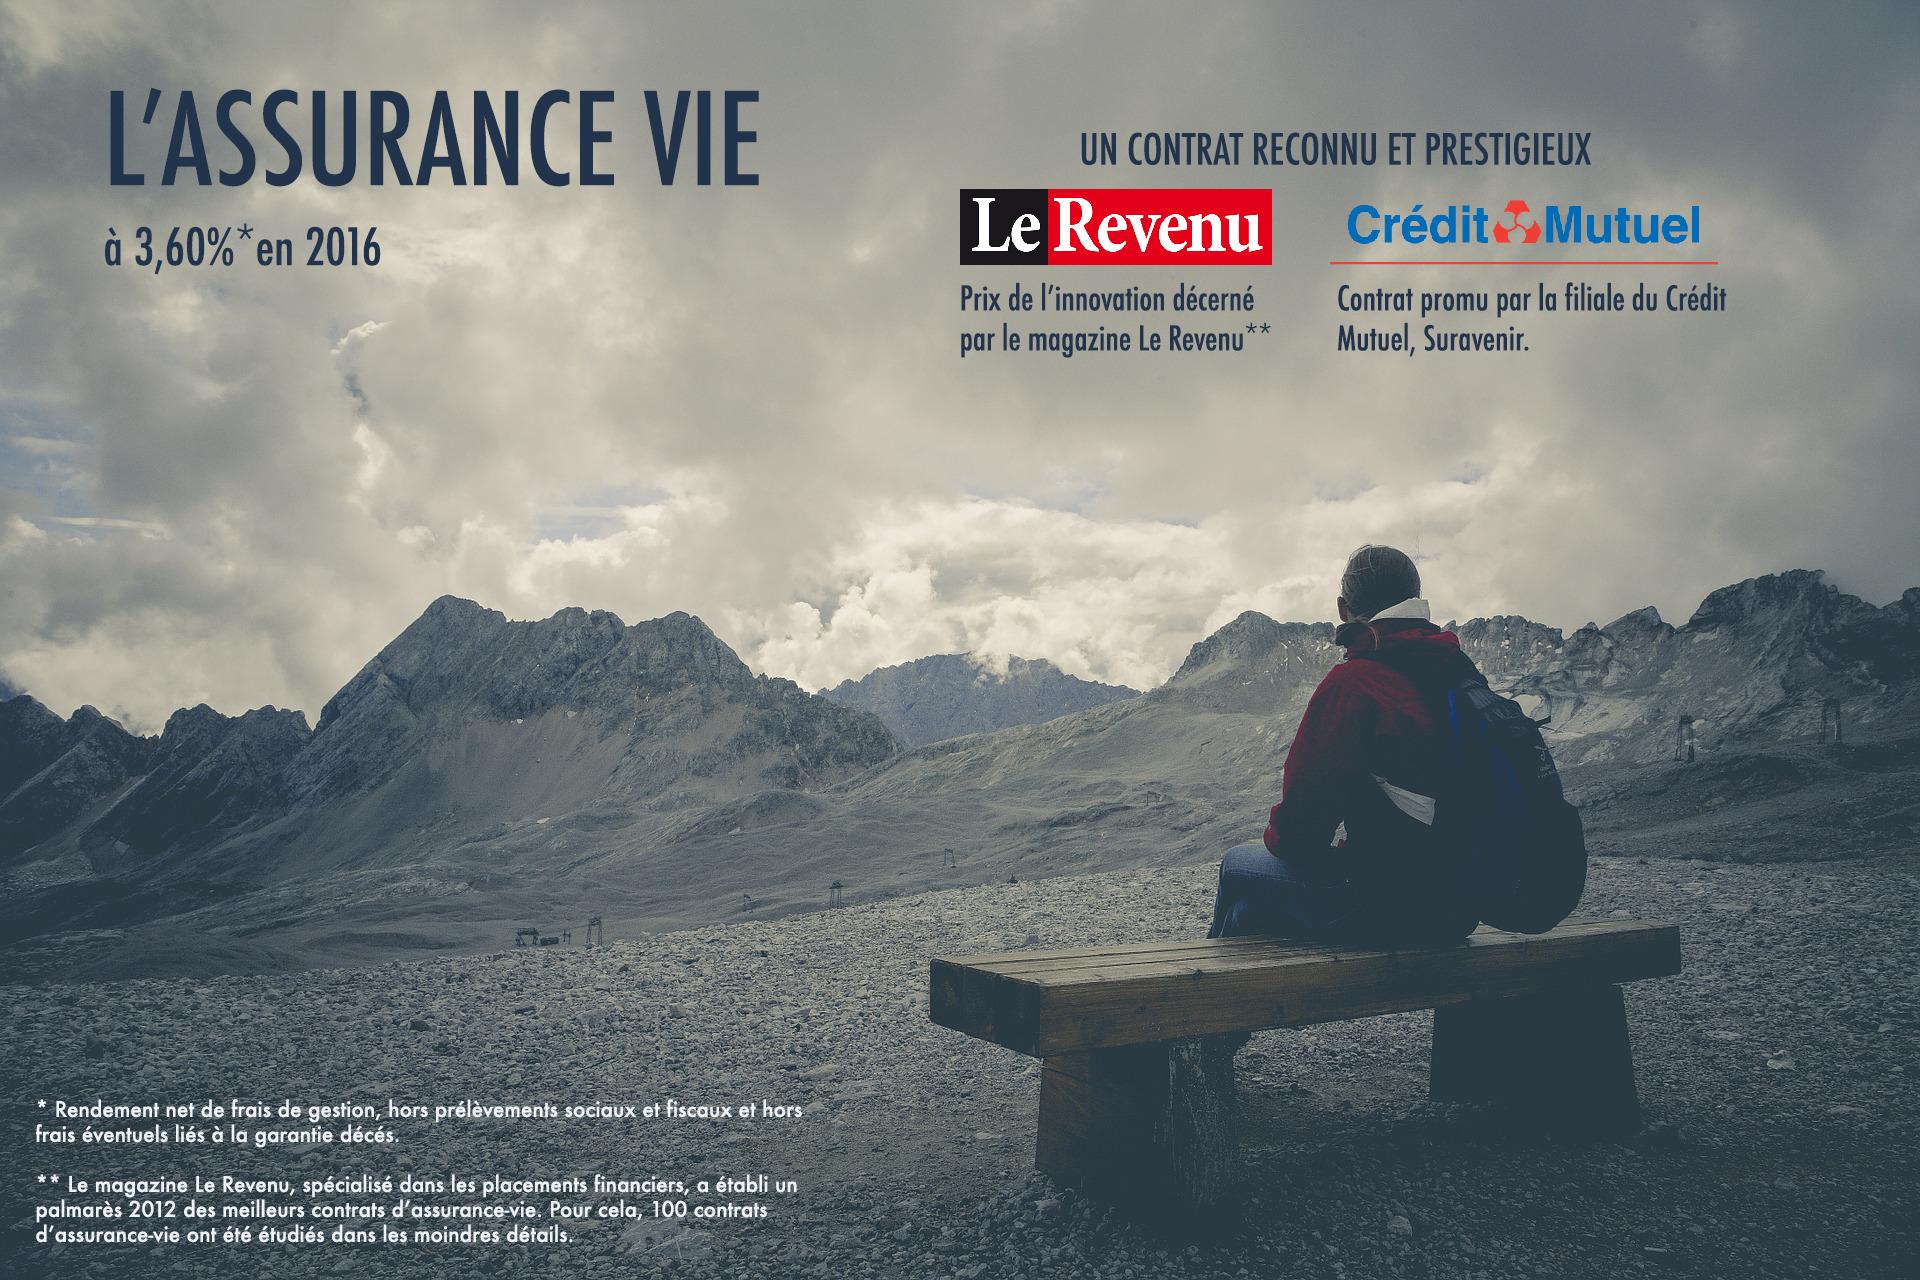 visu_assurancevie_nouveau